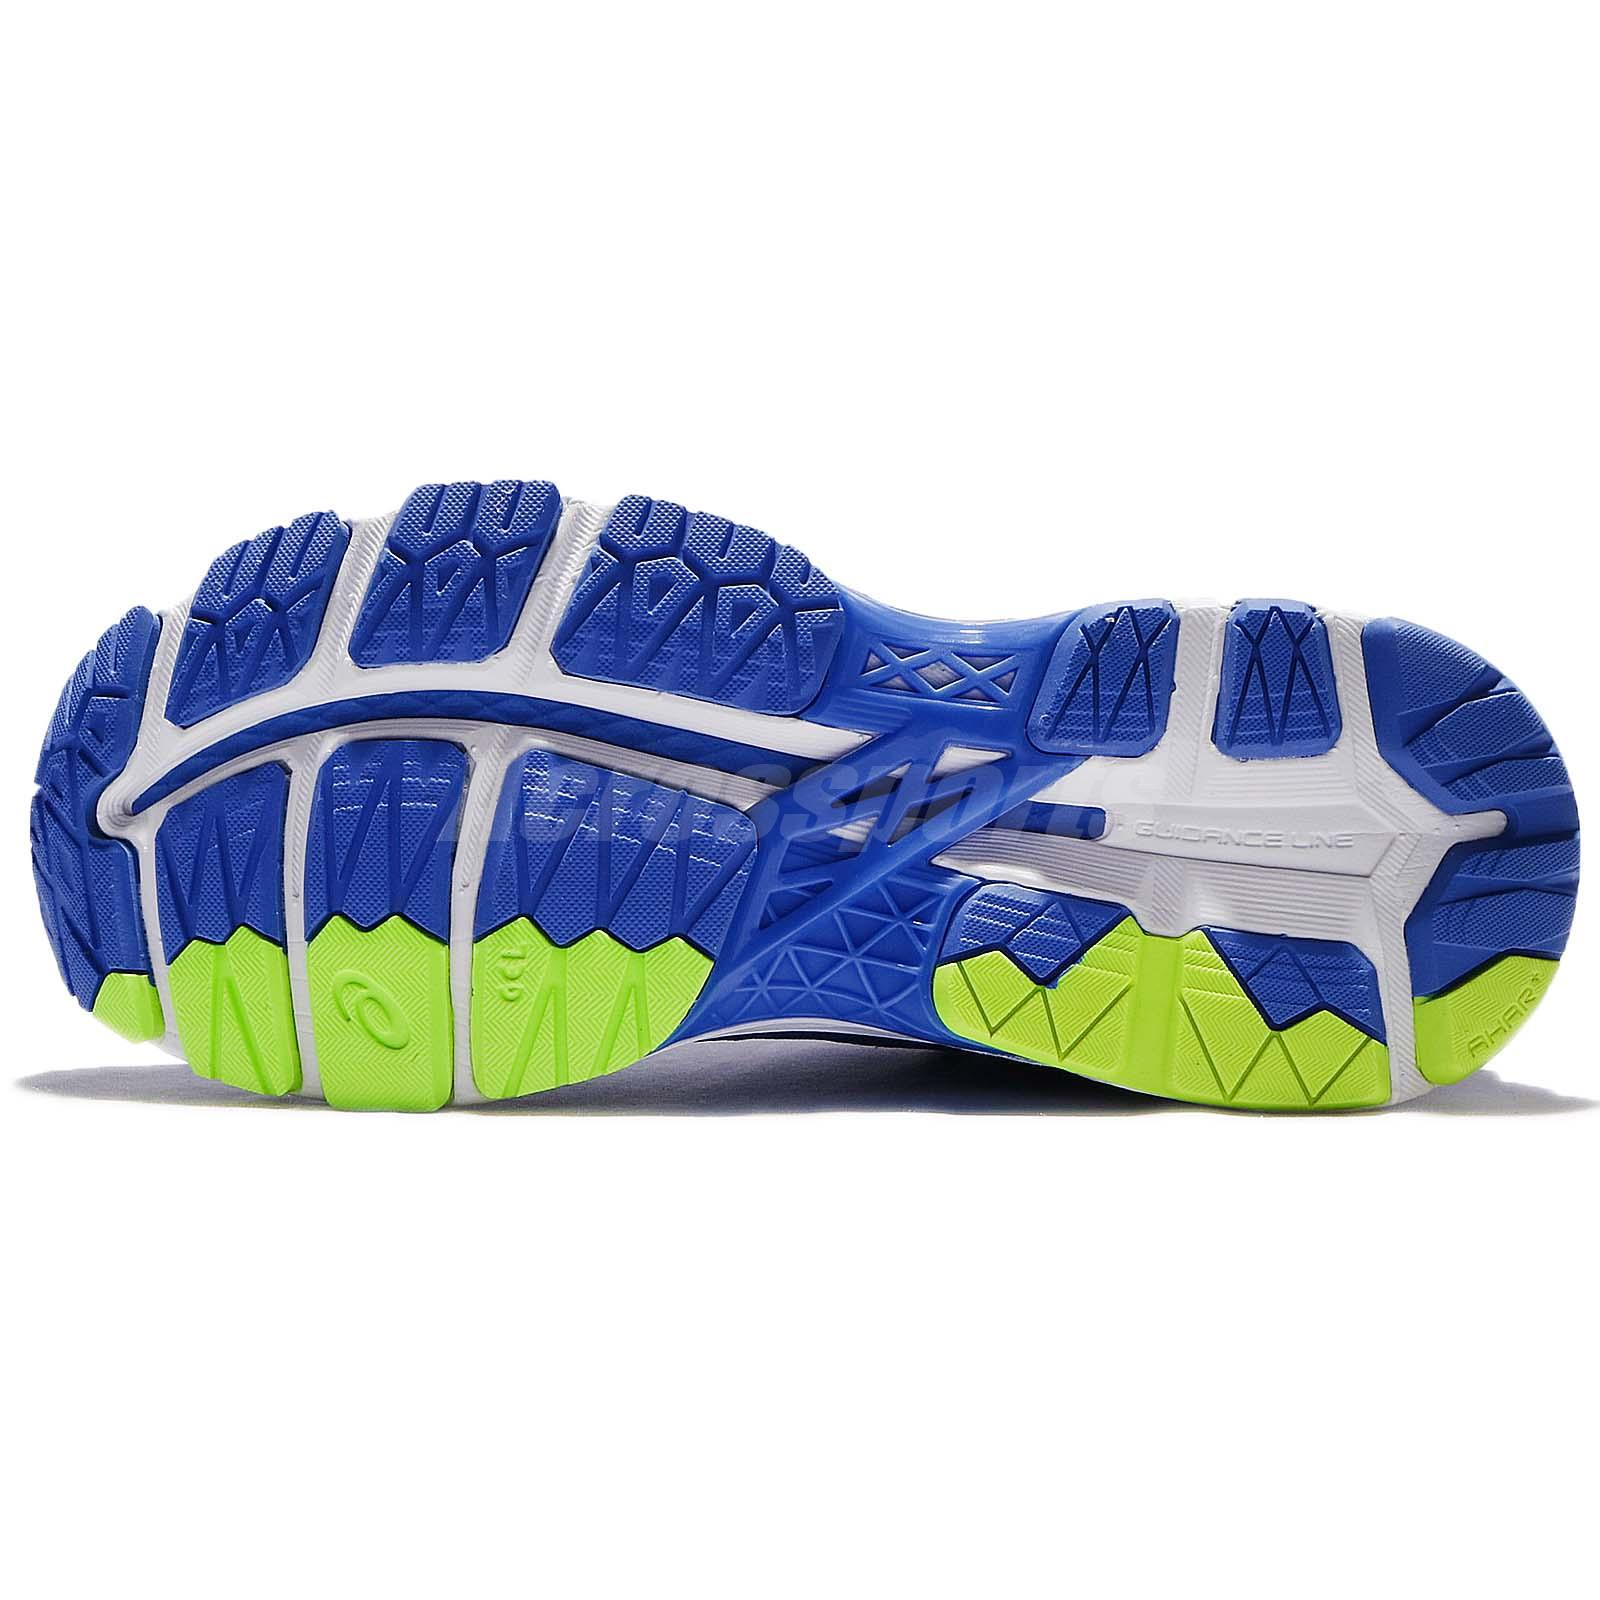 66958fa6119ed Asics Gel-Kayano 24 D Wide Blue White Women Running Shoes Sneakers ...